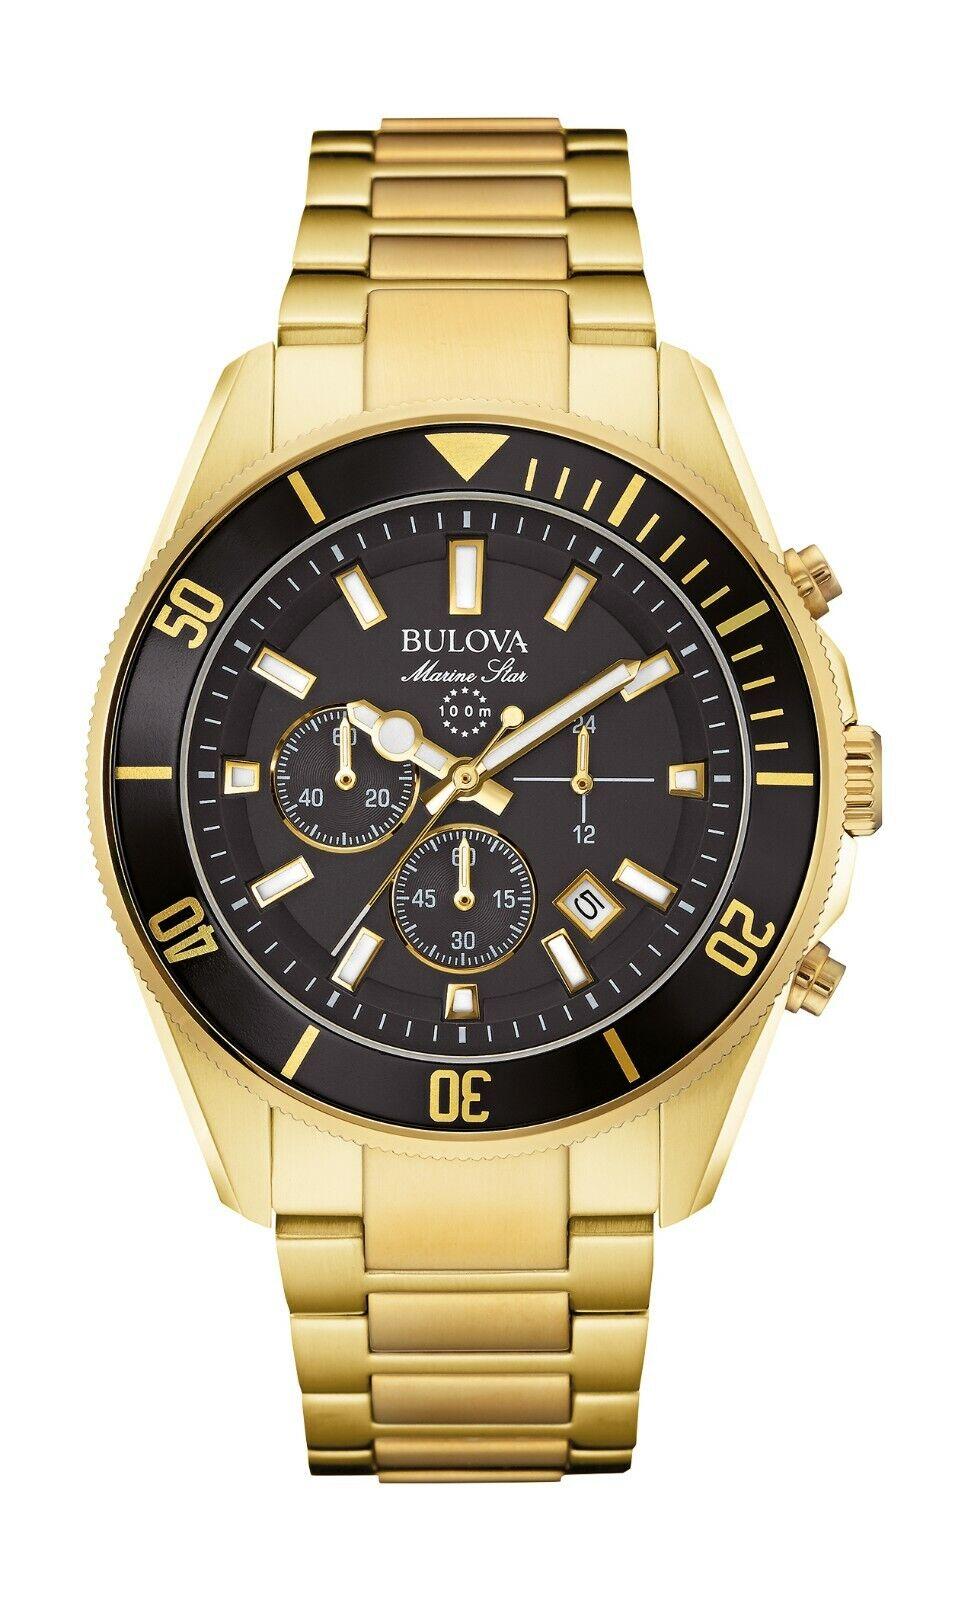 Bulova Men's Chronograph Marine Star Gold-Tone Stainless Ste